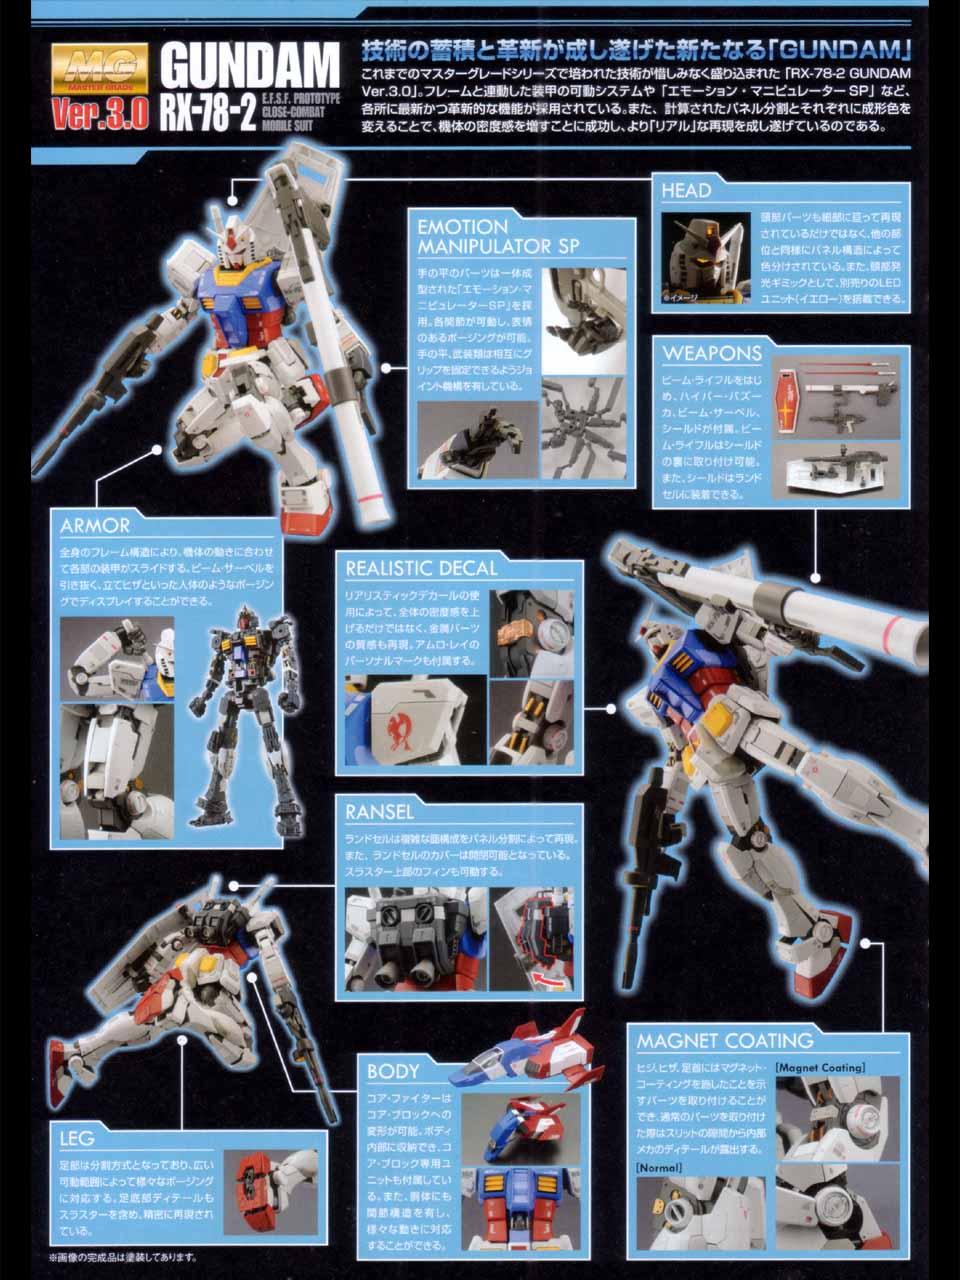 MG_RX78_2_Gundam_Ver3_A06.jpg